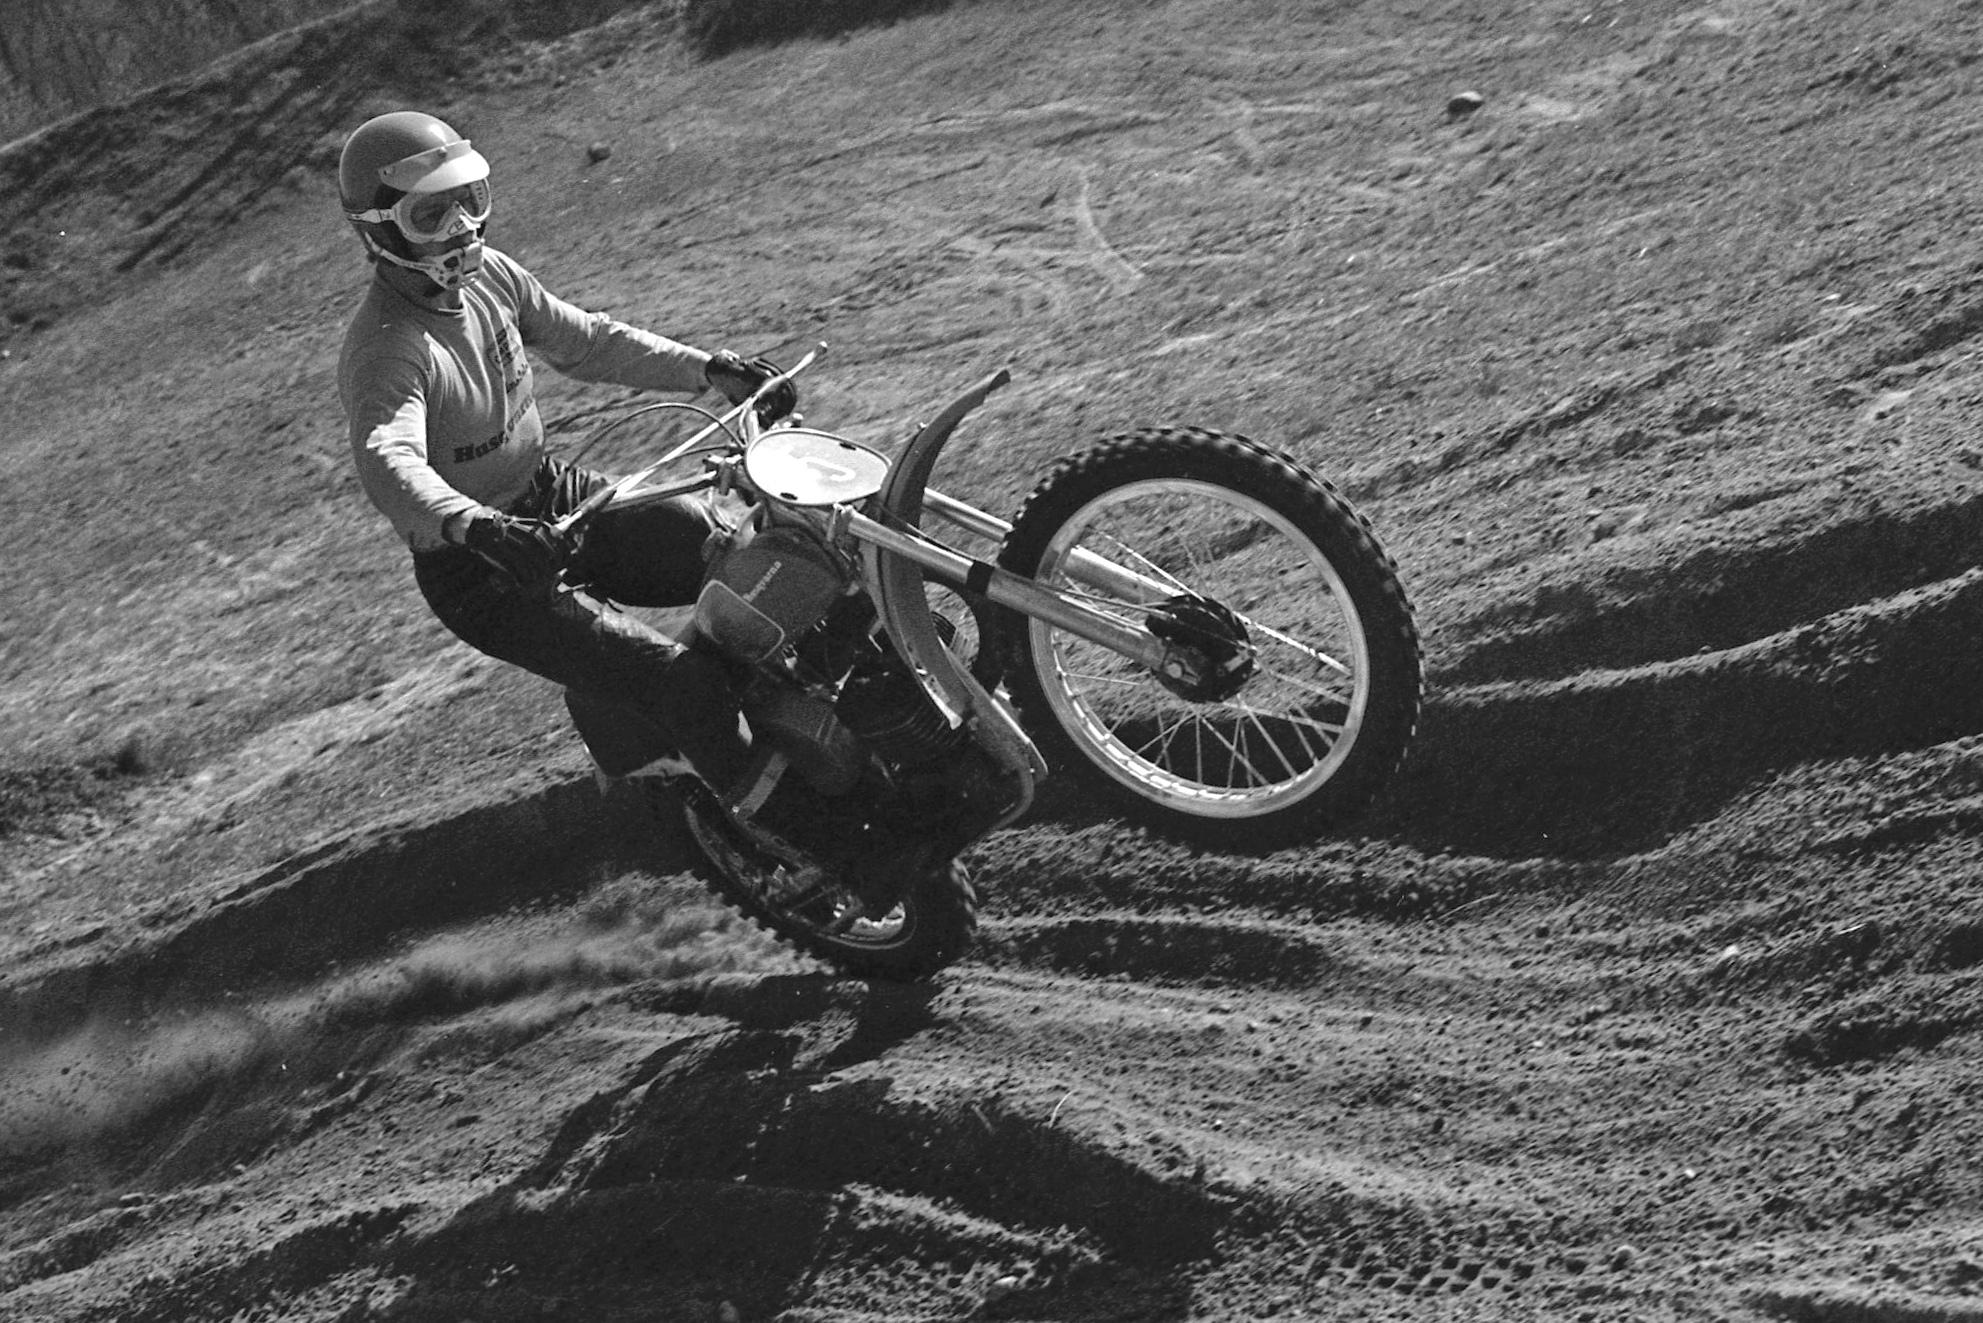 vintage-GP-1960s-11.jpg#asset:37241